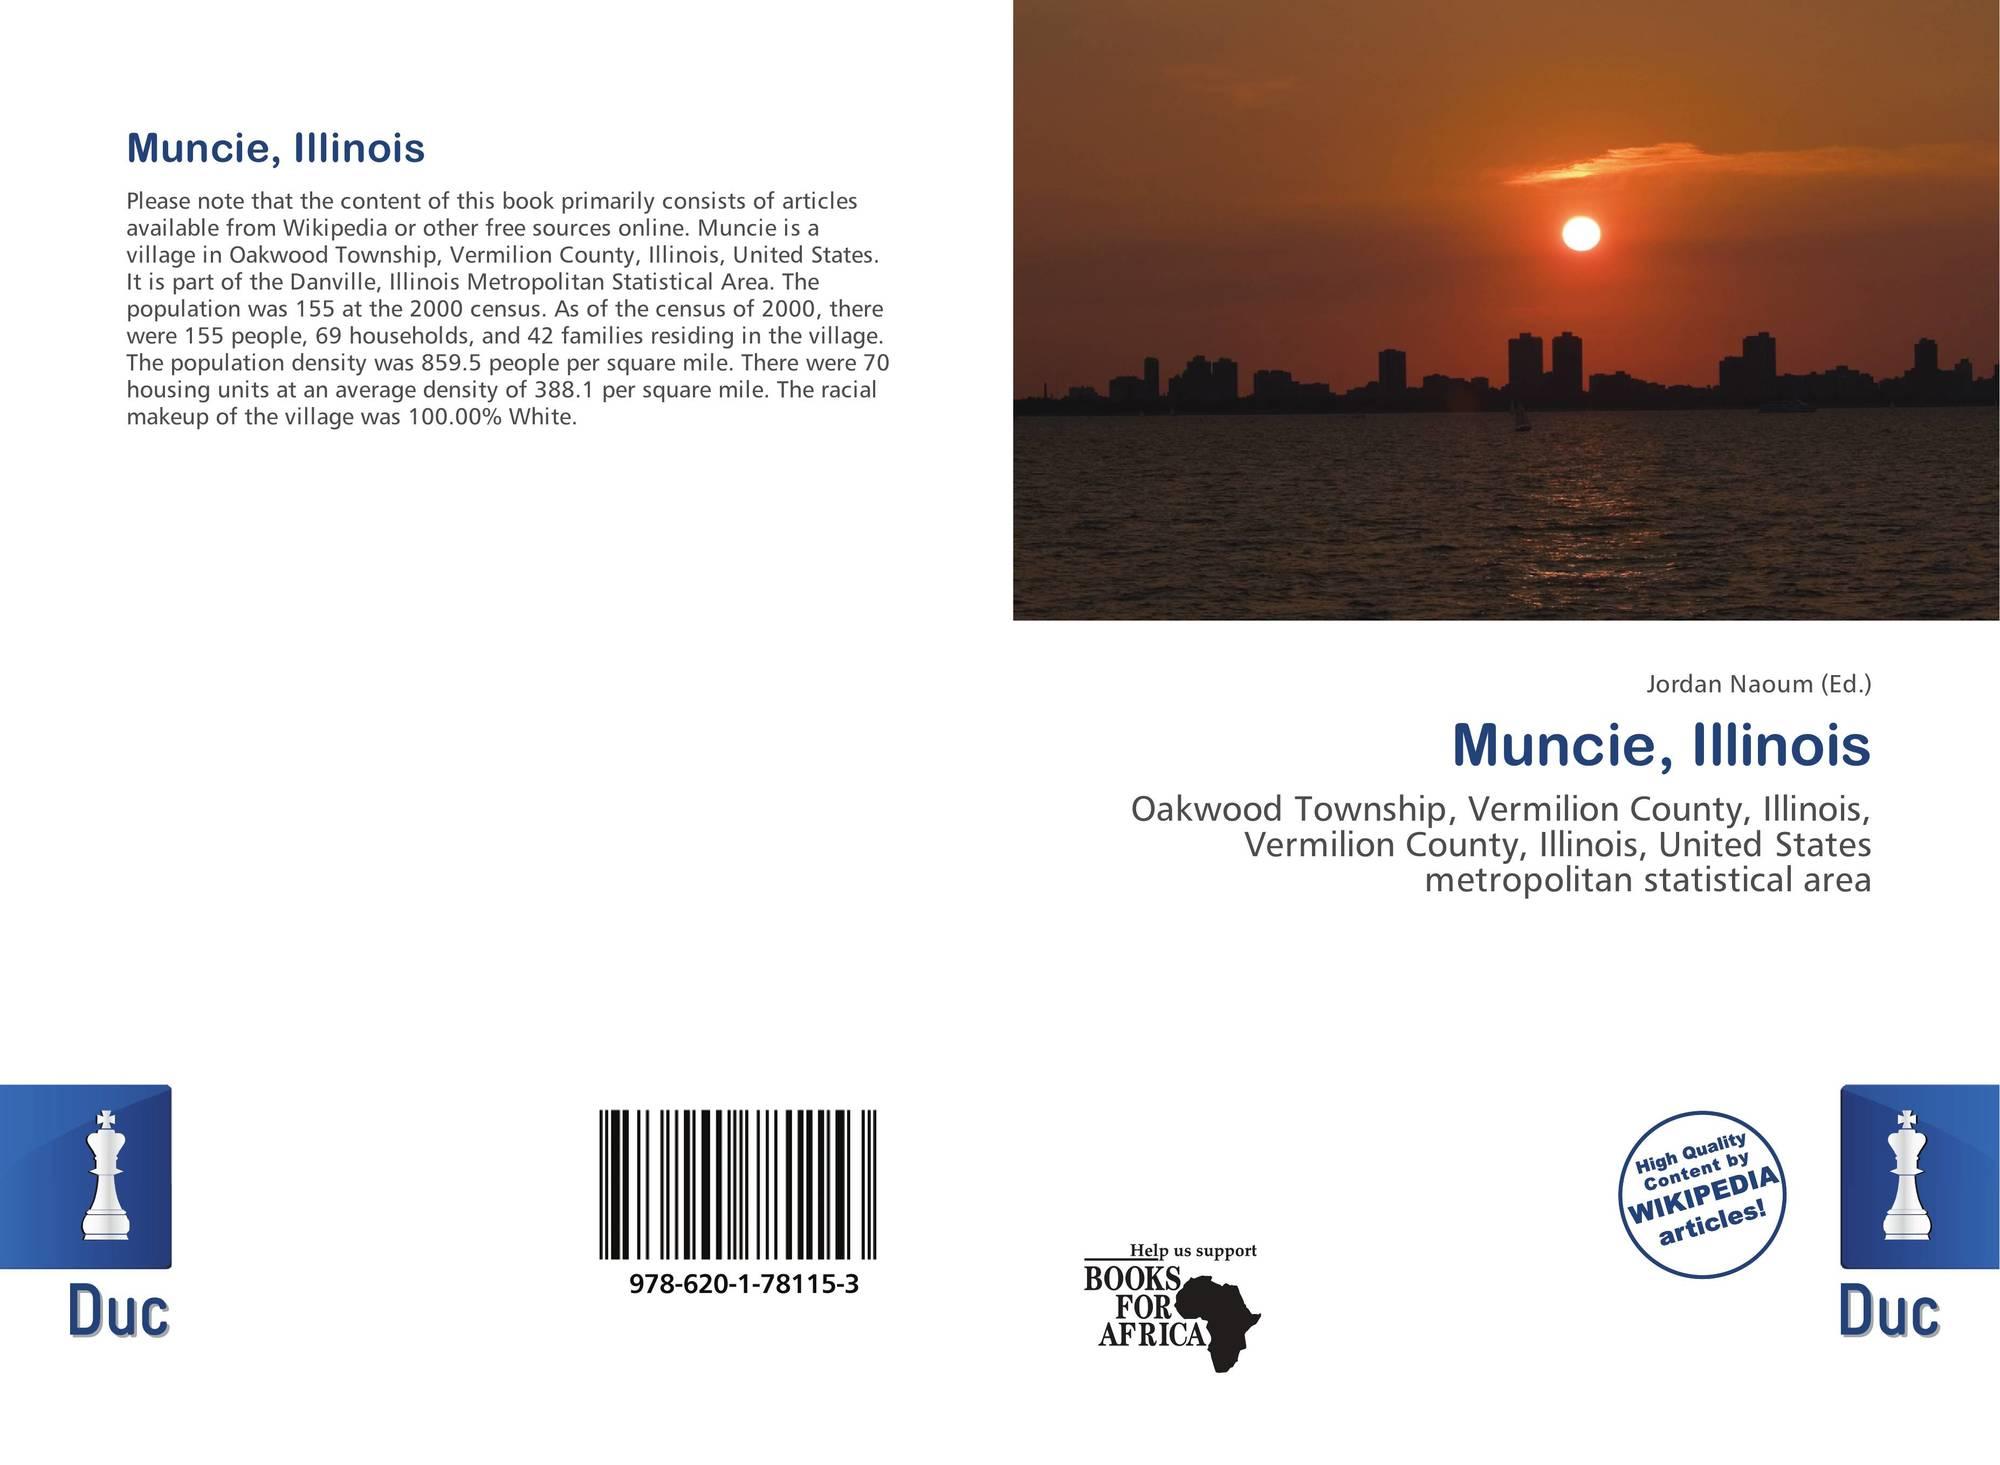 Illinois vermilion county muncie - Bookcover Of Muncie Illinois Omni Badge 9307e2201e5f762643a64561af3456be64a87707602f96b92ef18a9bbcada116